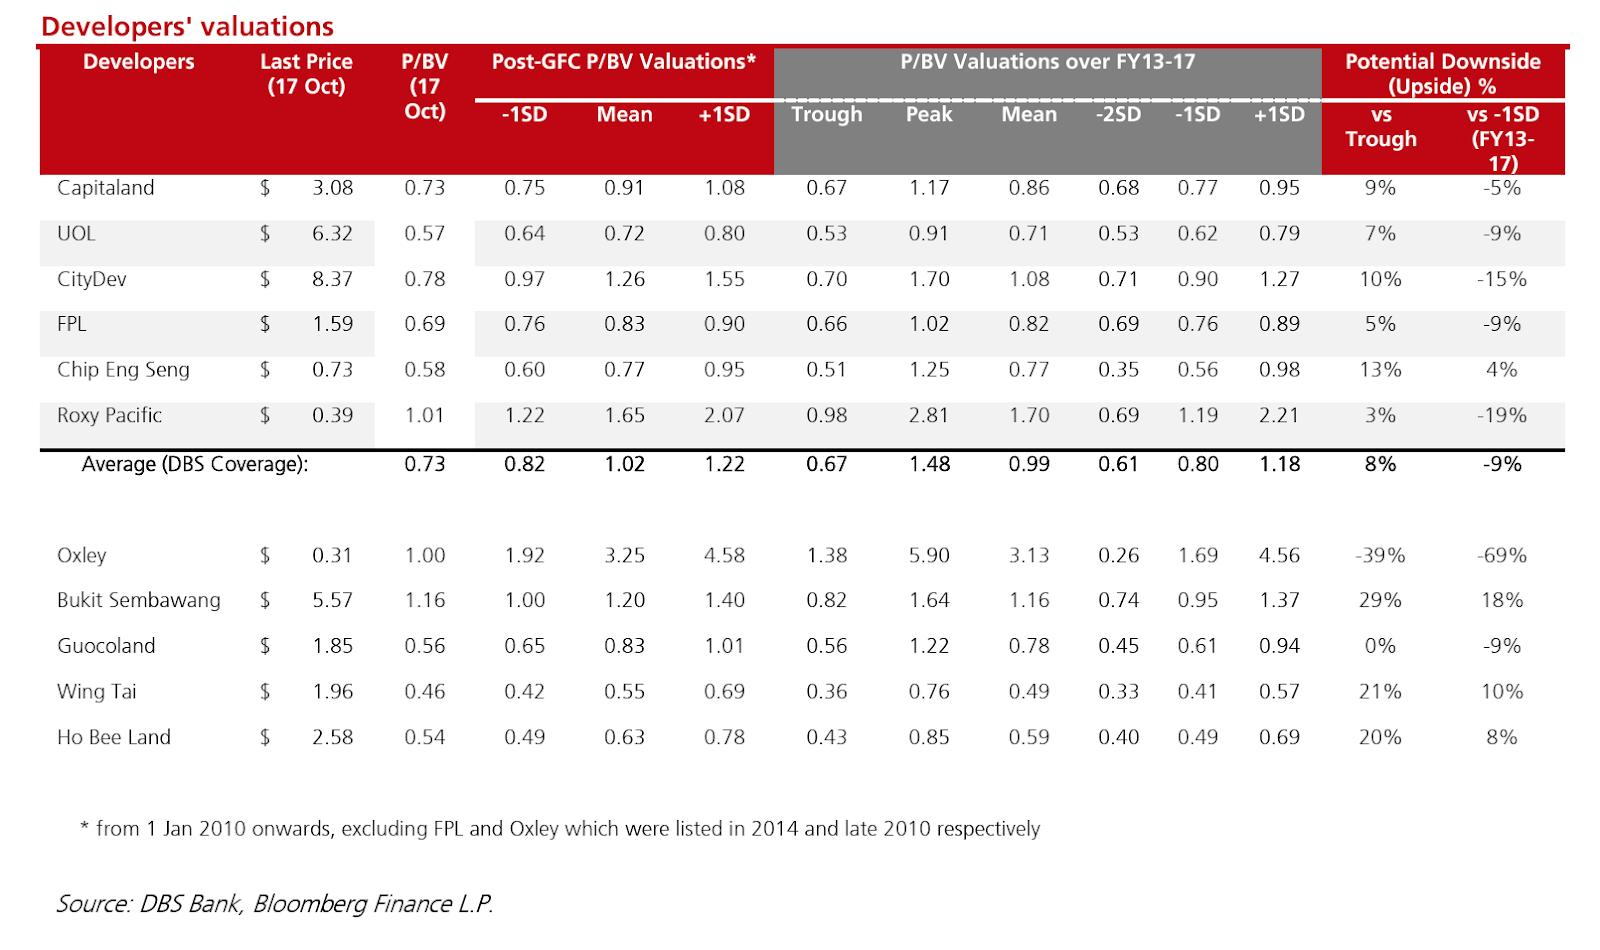 Singapore Property Developers Stocks Valuation - DBSV 181018